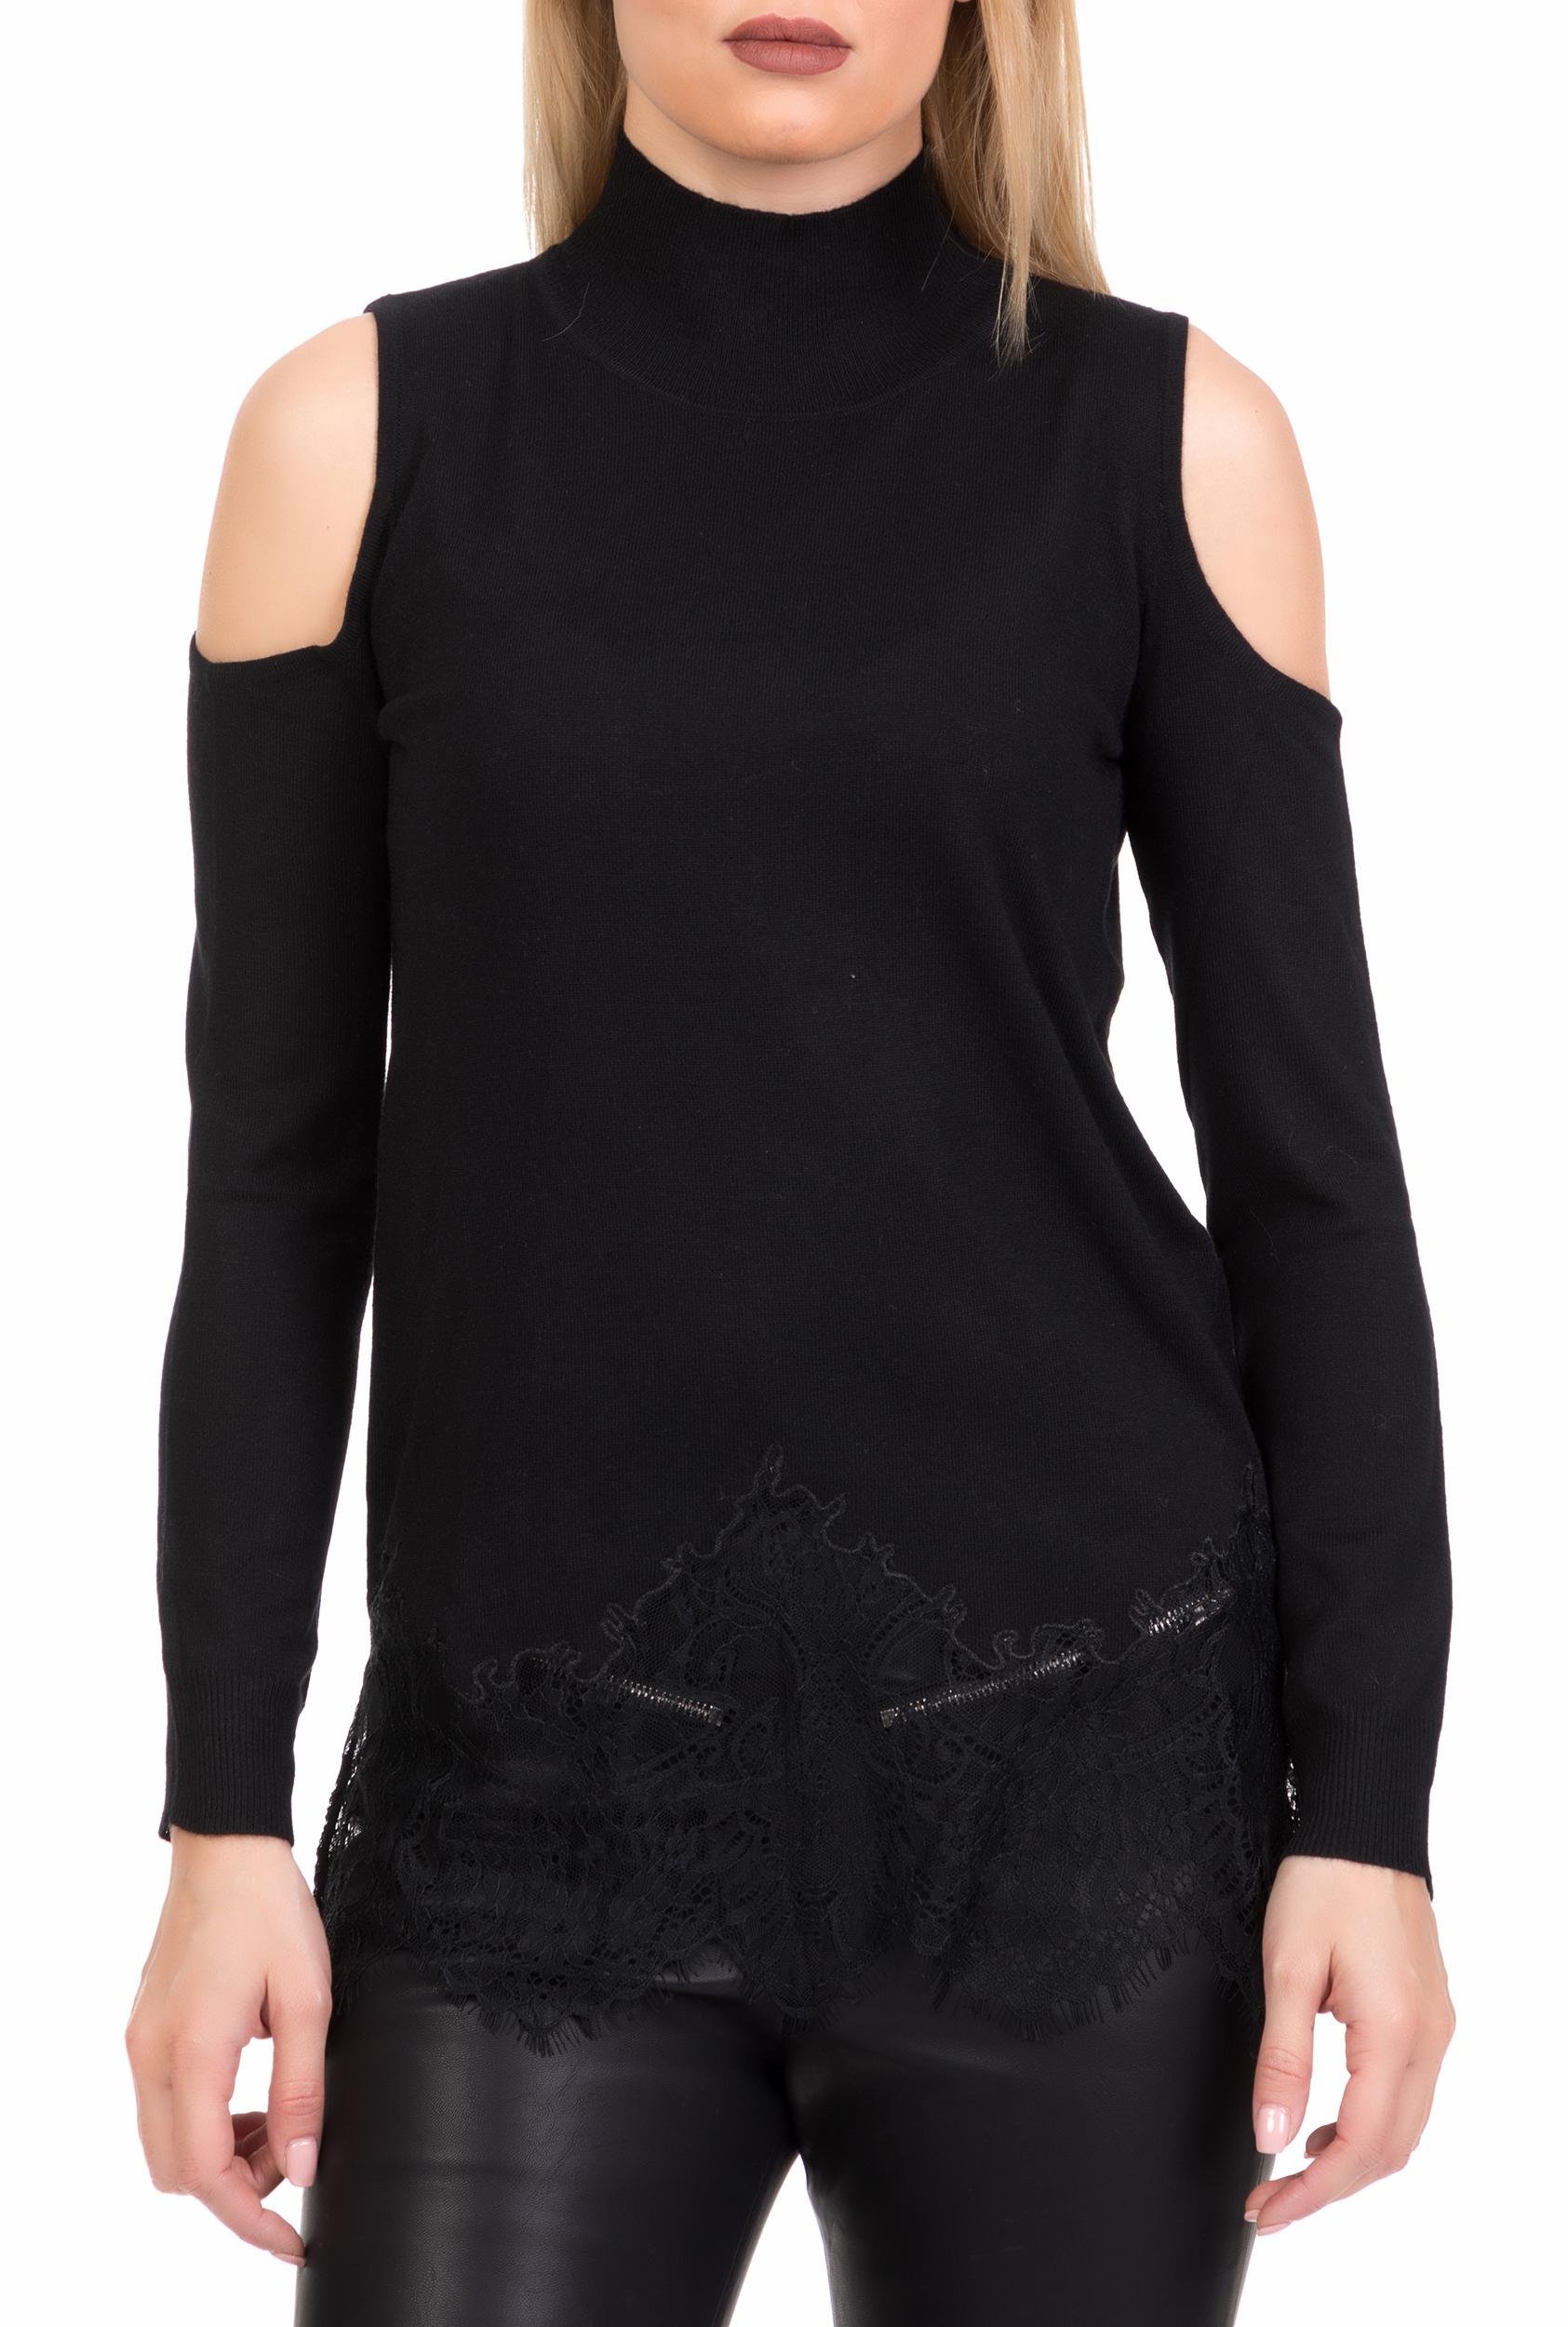 663e82af070e μπλούζες ζιβάγκο γυναικειες μόνο στο Gynaikeia.com! Τι περιμένεις;